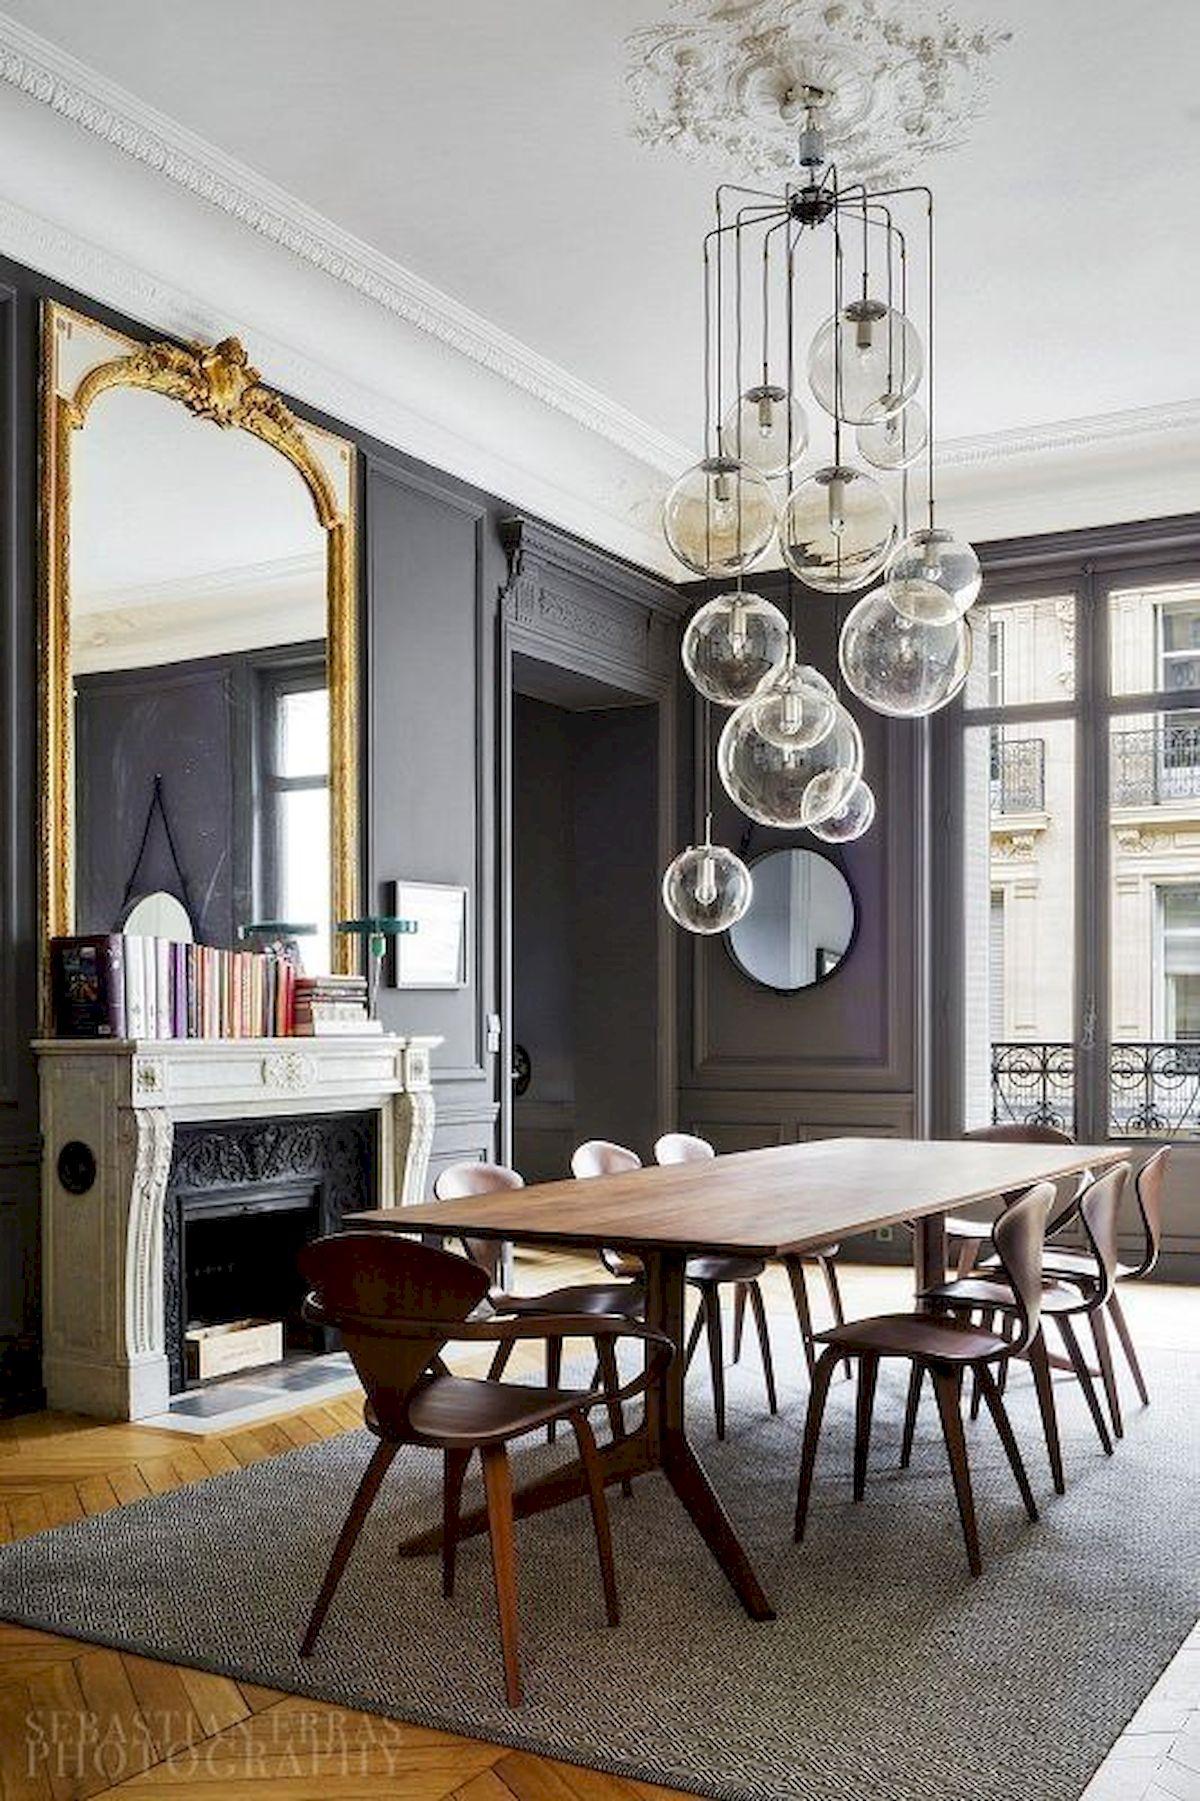 80 Elegant Modern Dining Room Design And Decor Ideas (47)